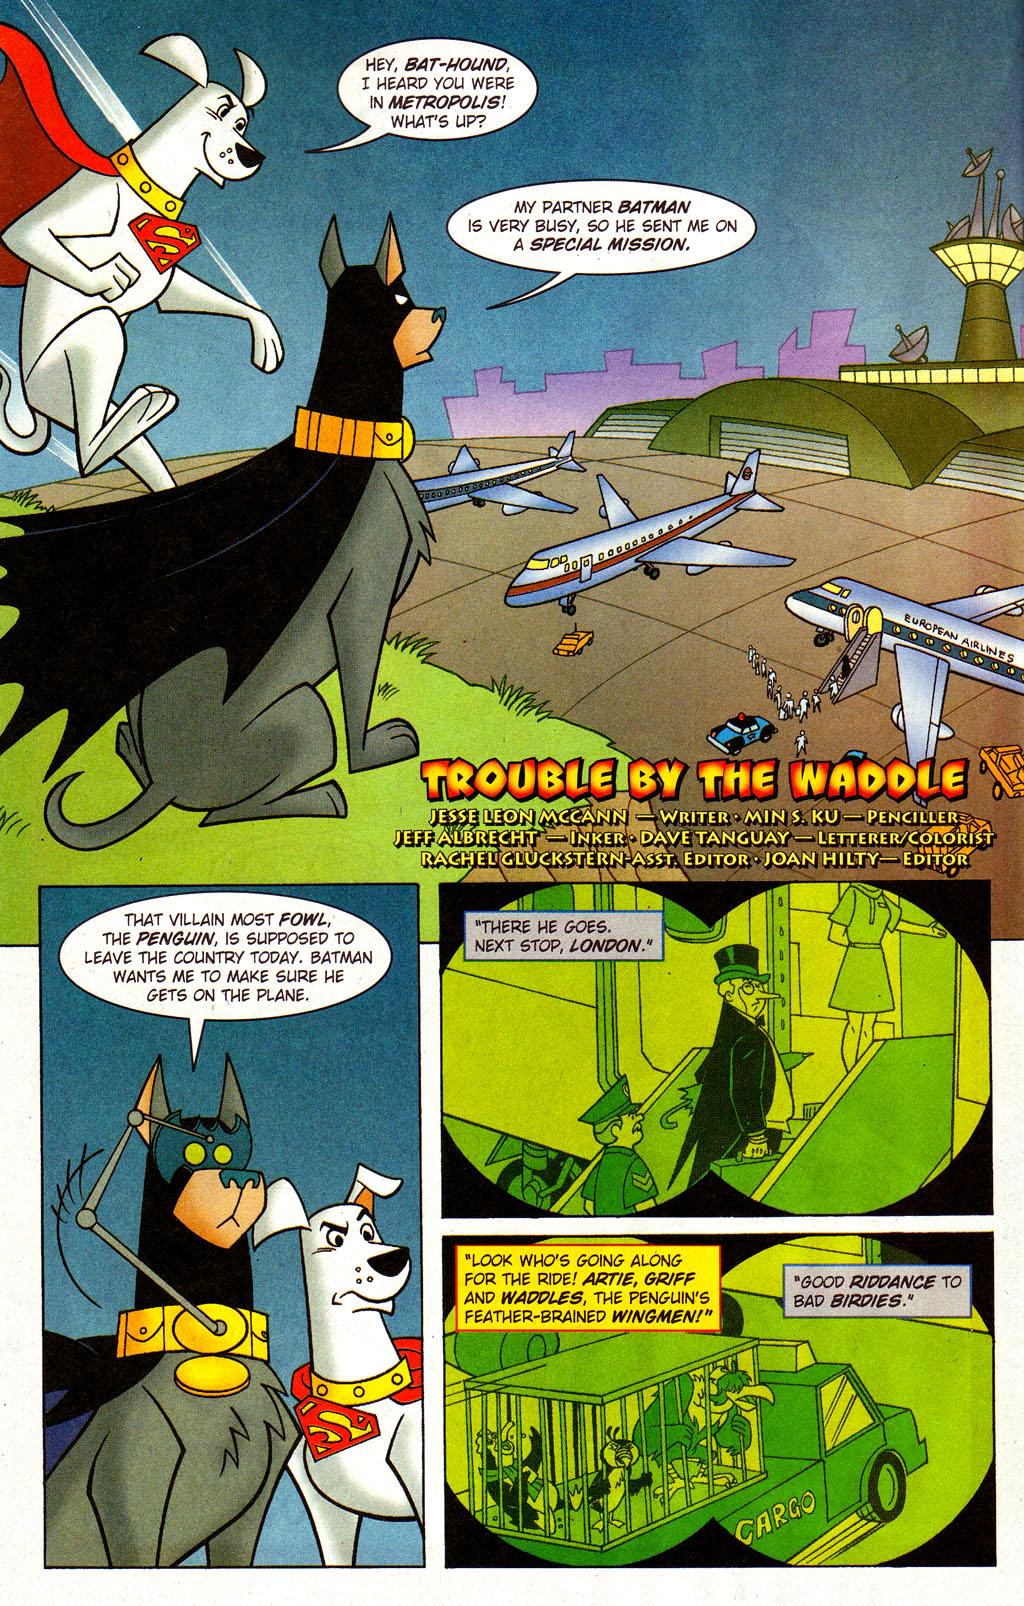 Read online Krypto the Superdog comic -  Issue #3 - 12